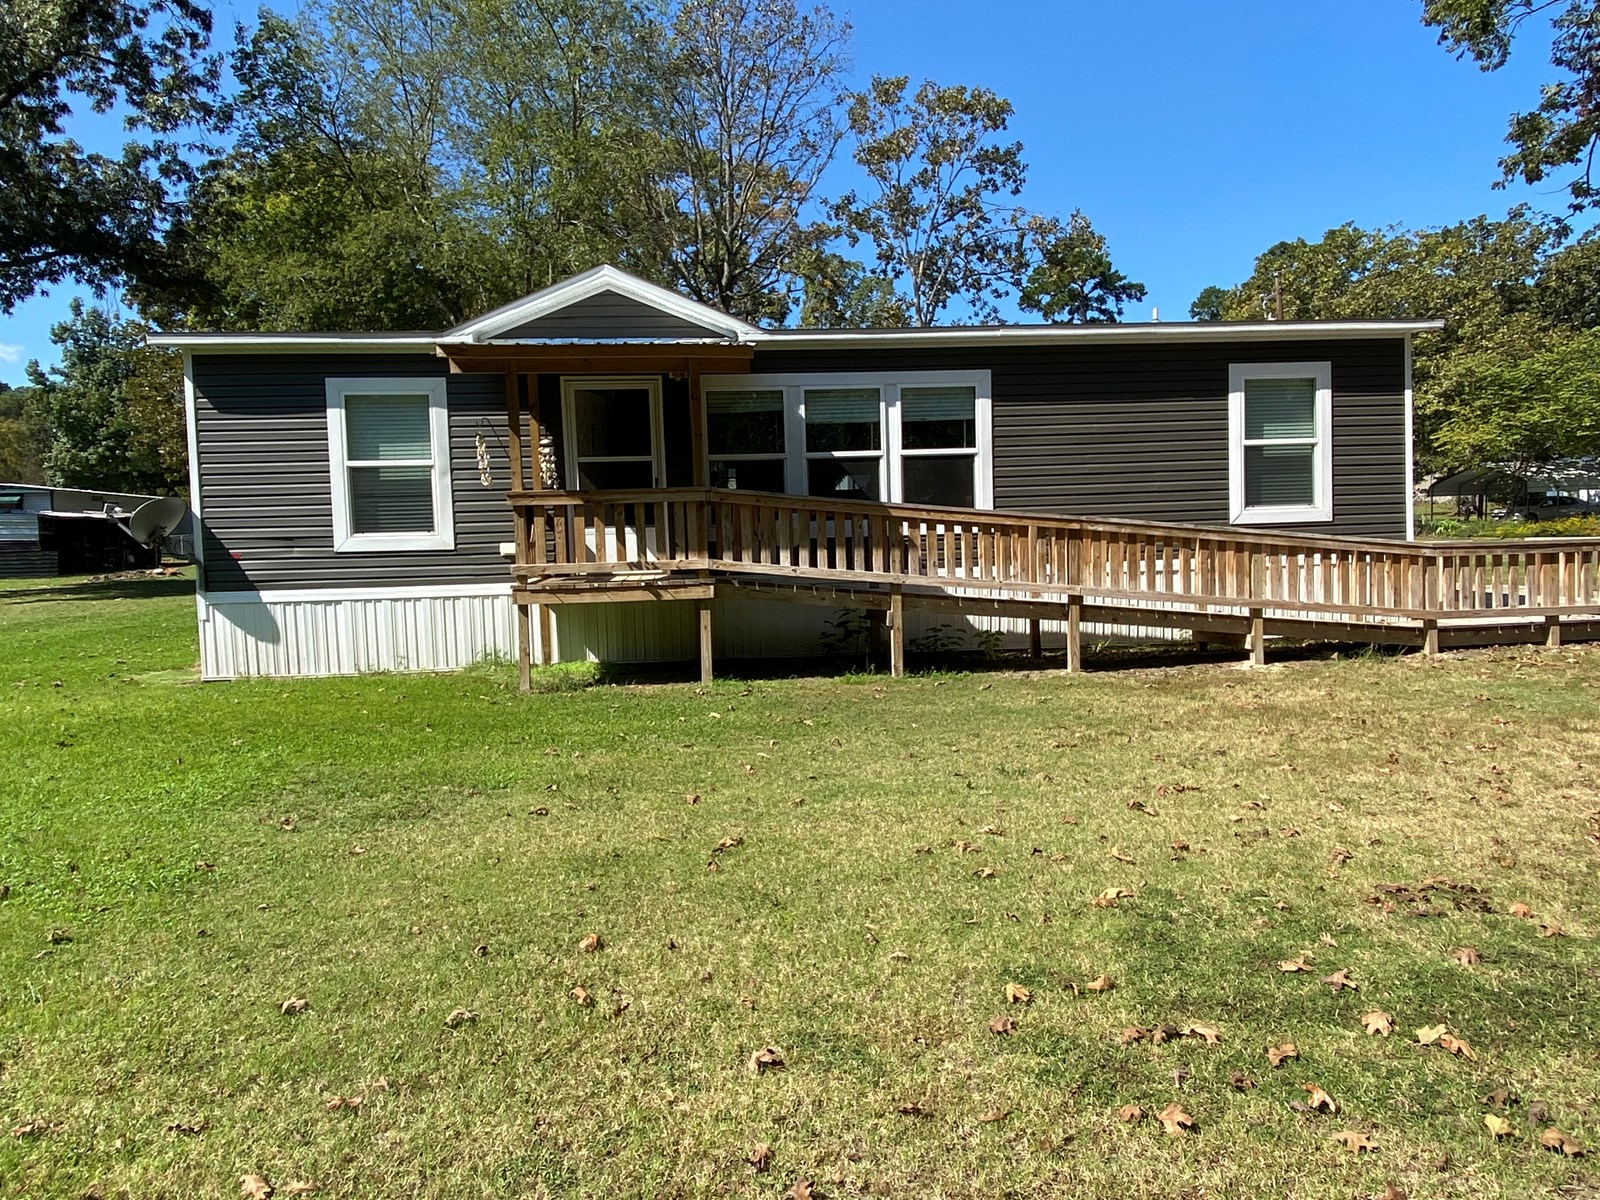 Home at Lake O' The Pines, Marion County, Avinger, Texas